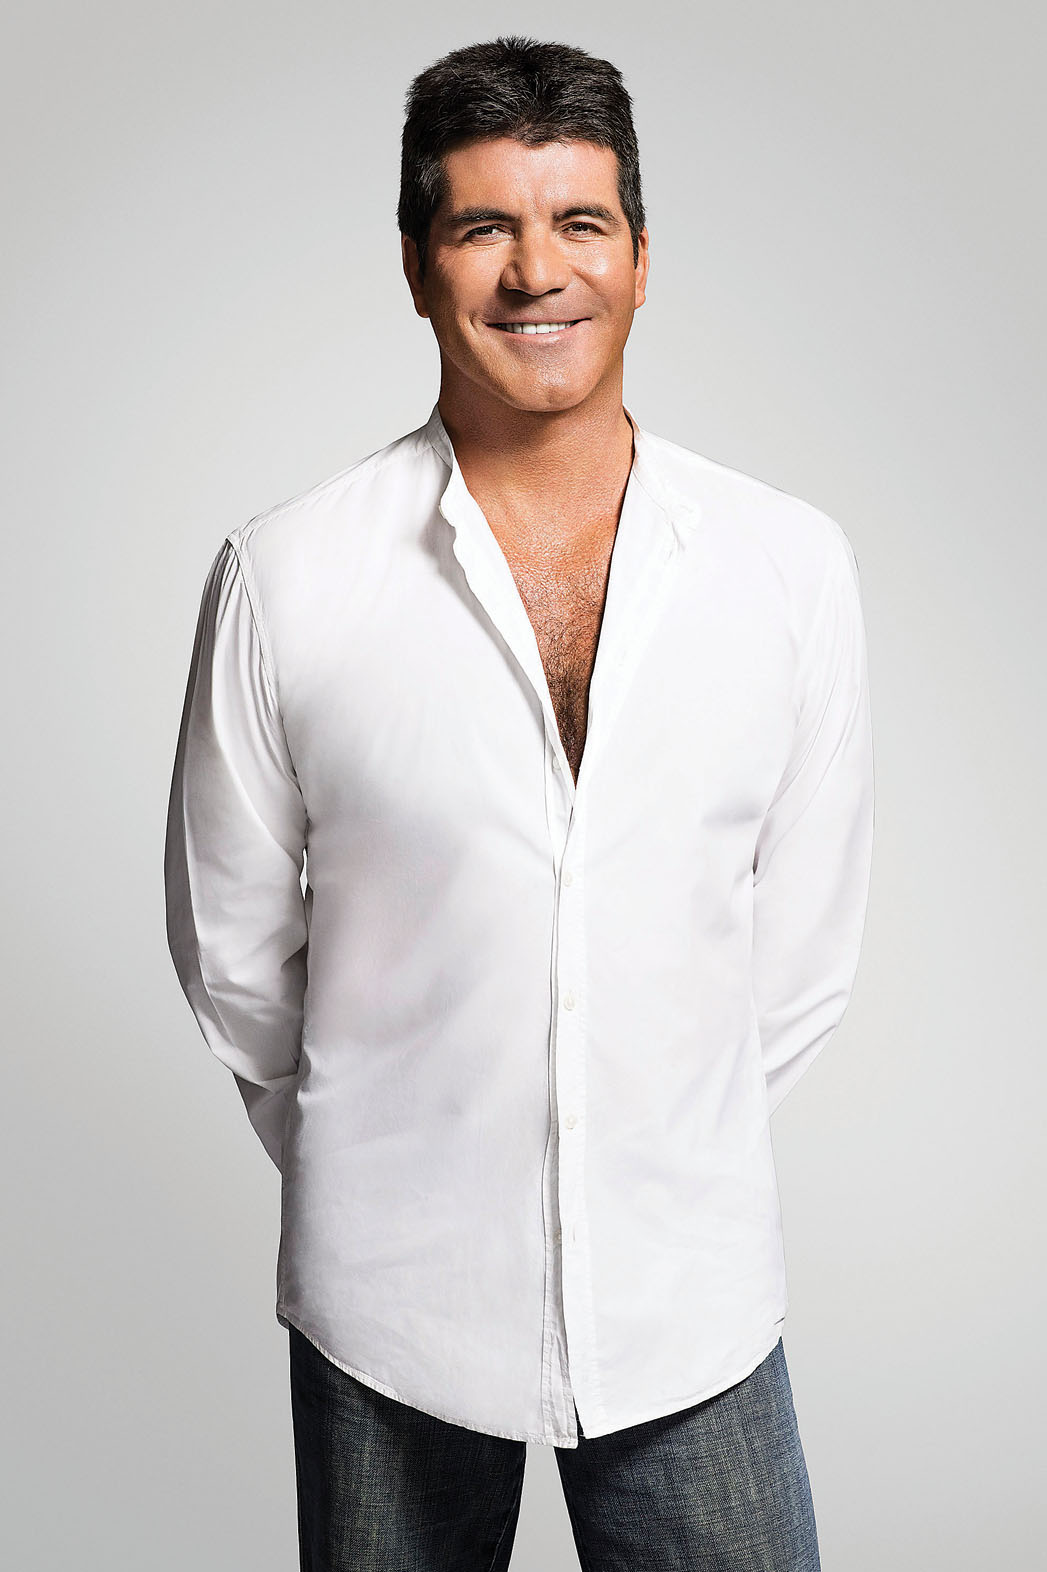 Simon Cowell Headshot - P 2014